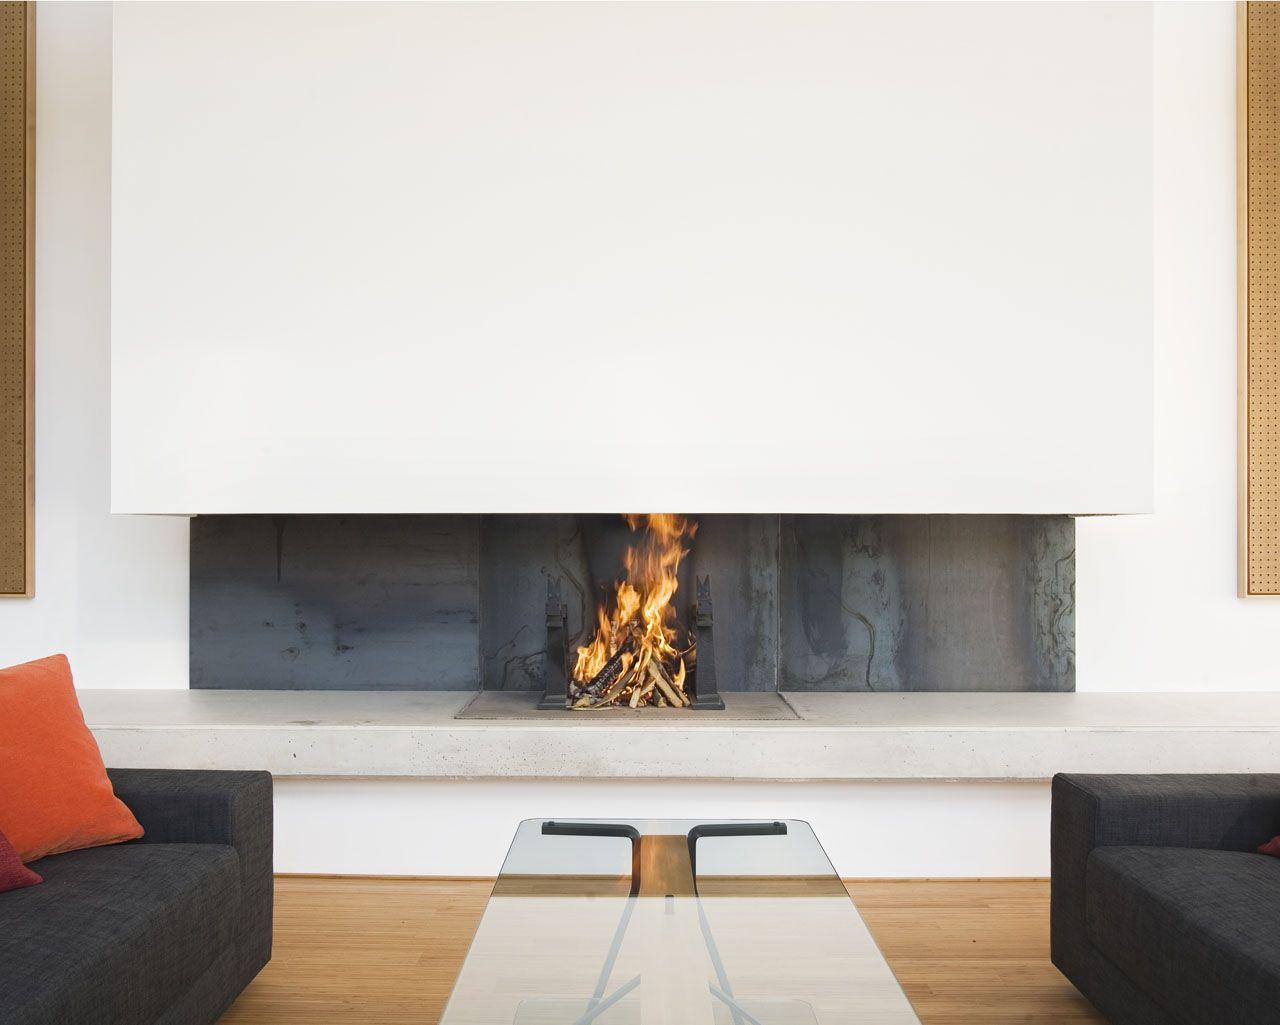 offene kamine lenz und d rrenberg gmbh cozy fire. Black Bedroom Furniture Sets. Home Design Ideas